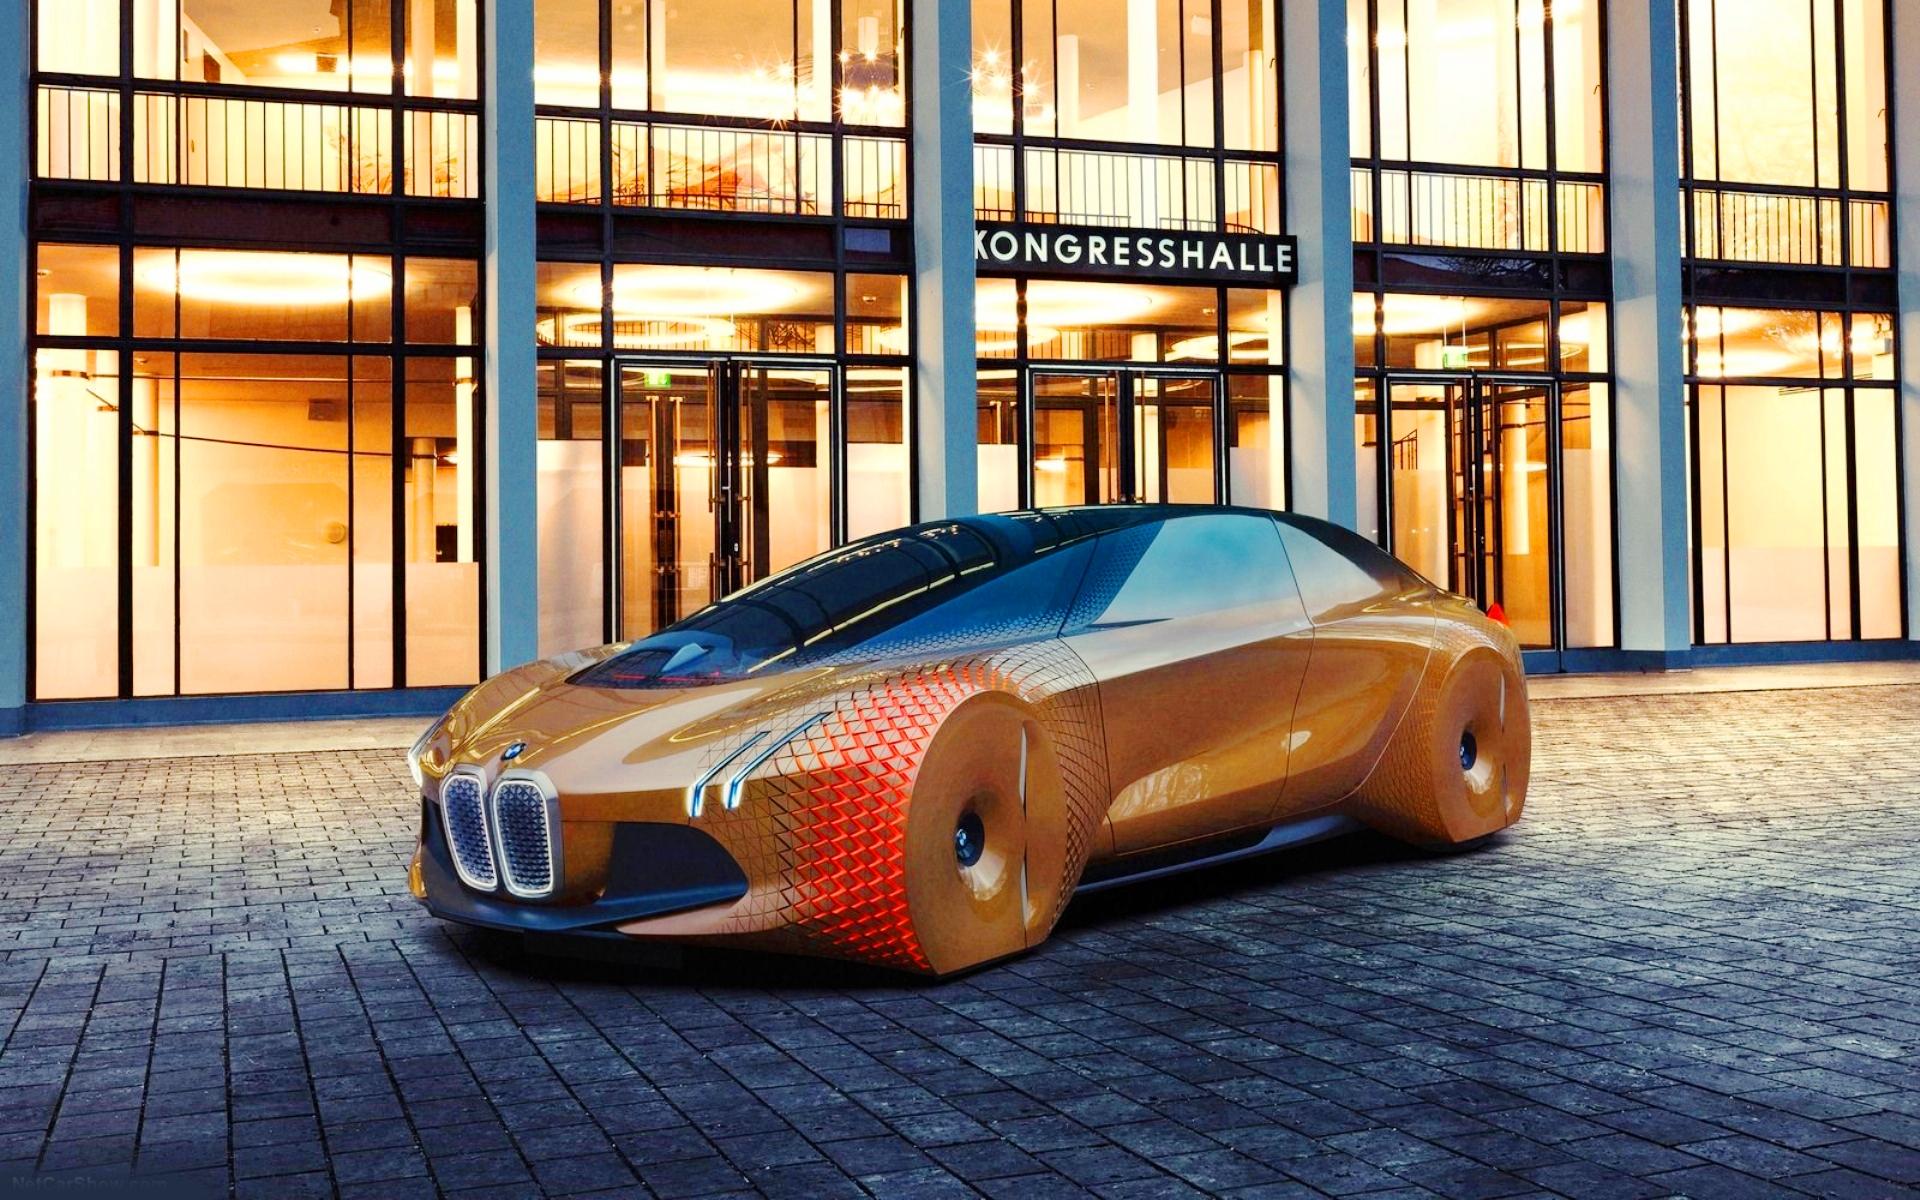 Картинка BMW Vision Next 100 » BMW | БМВ » Автомобили ...